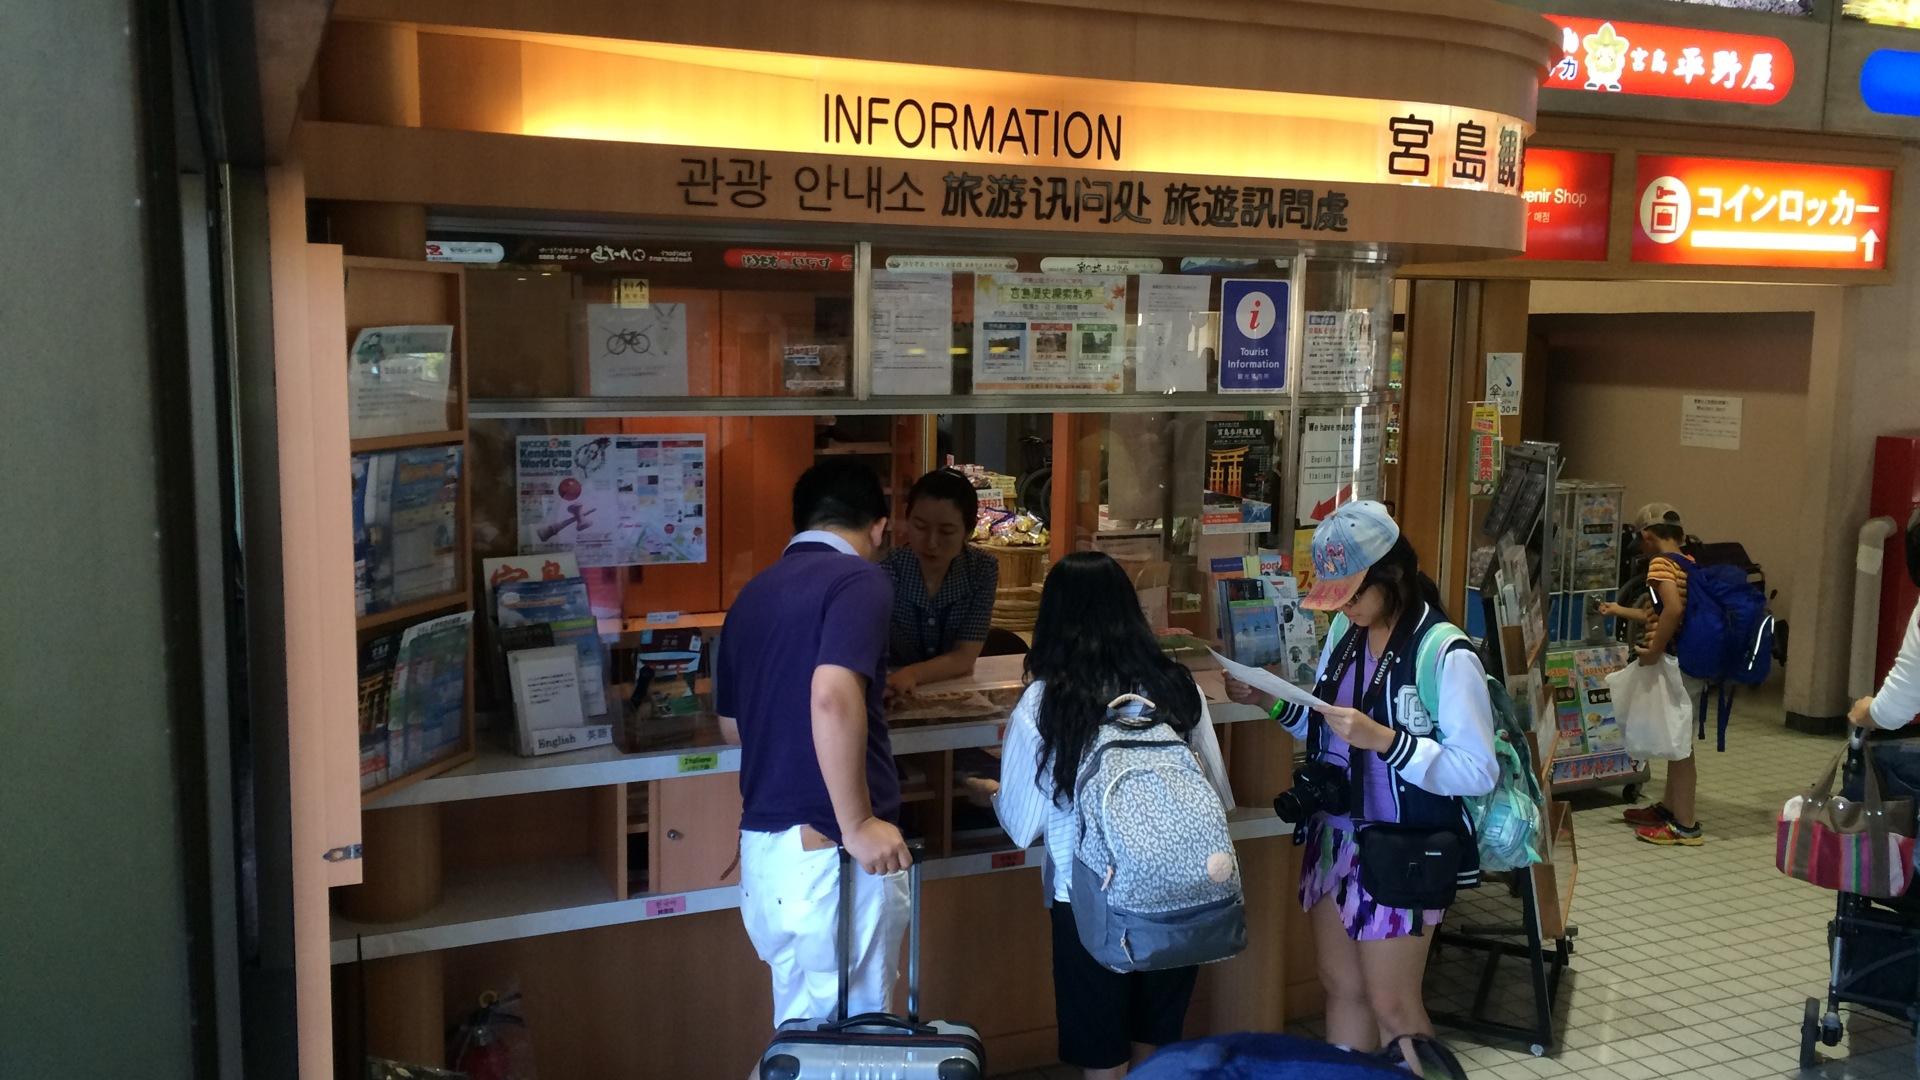 Miyajima Information